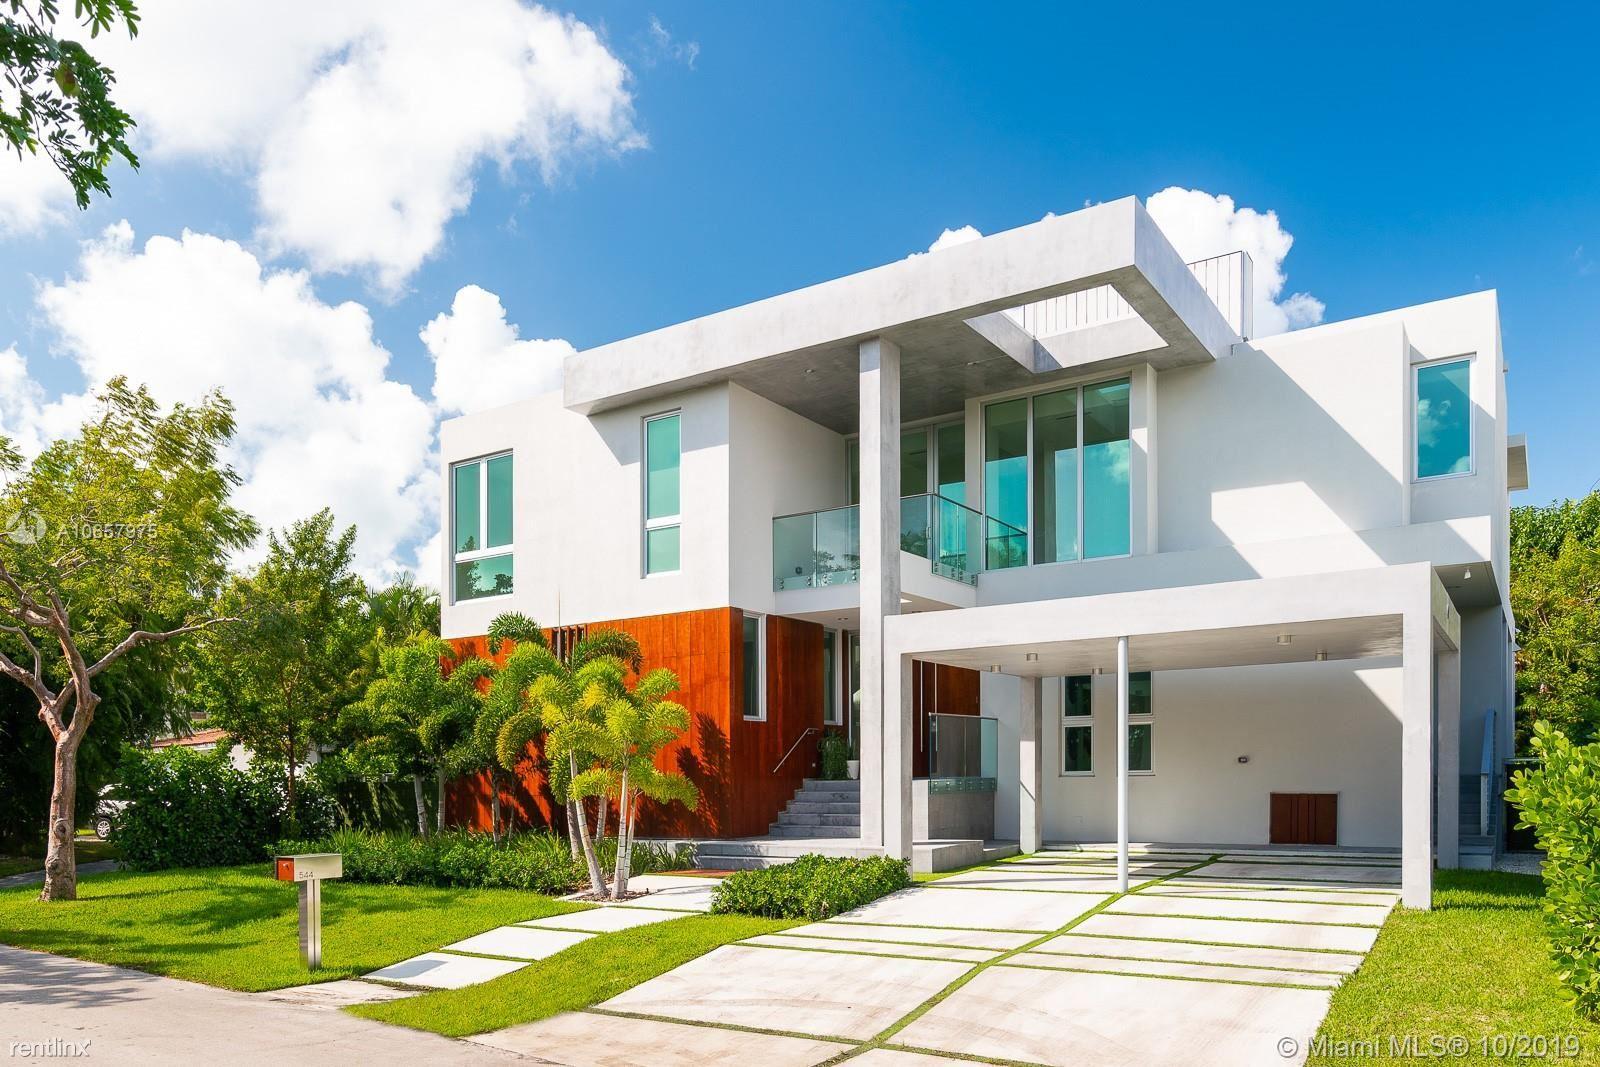 544 Ridgewood Rd, Key Biscayne, FL - $17,900